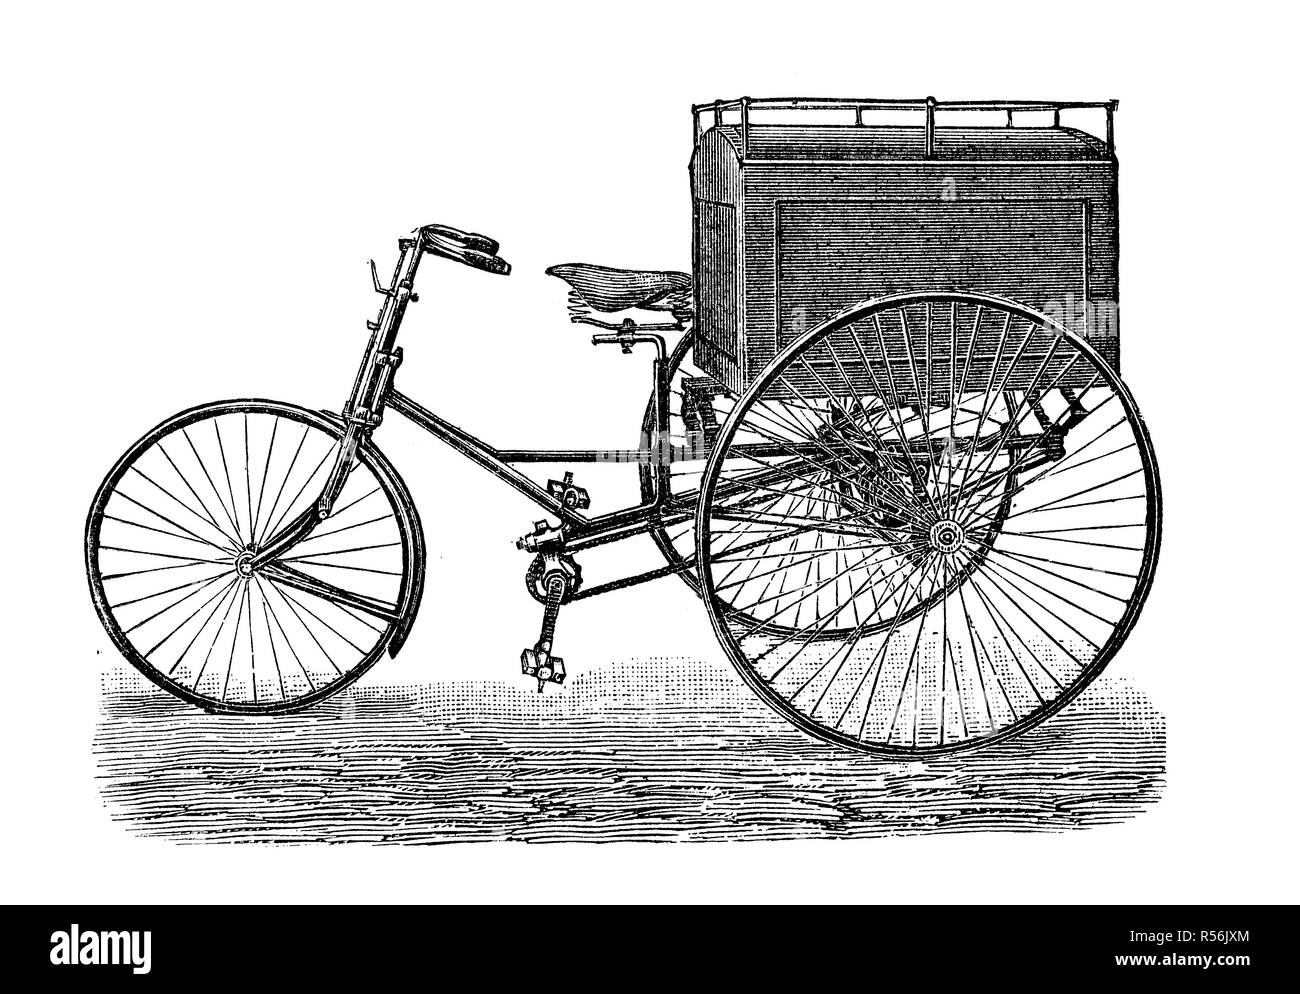 Velocipede, bicycle, 19th century and earlier, Gepäckdreirad, 1880, woodcut, Germany - Stock Image